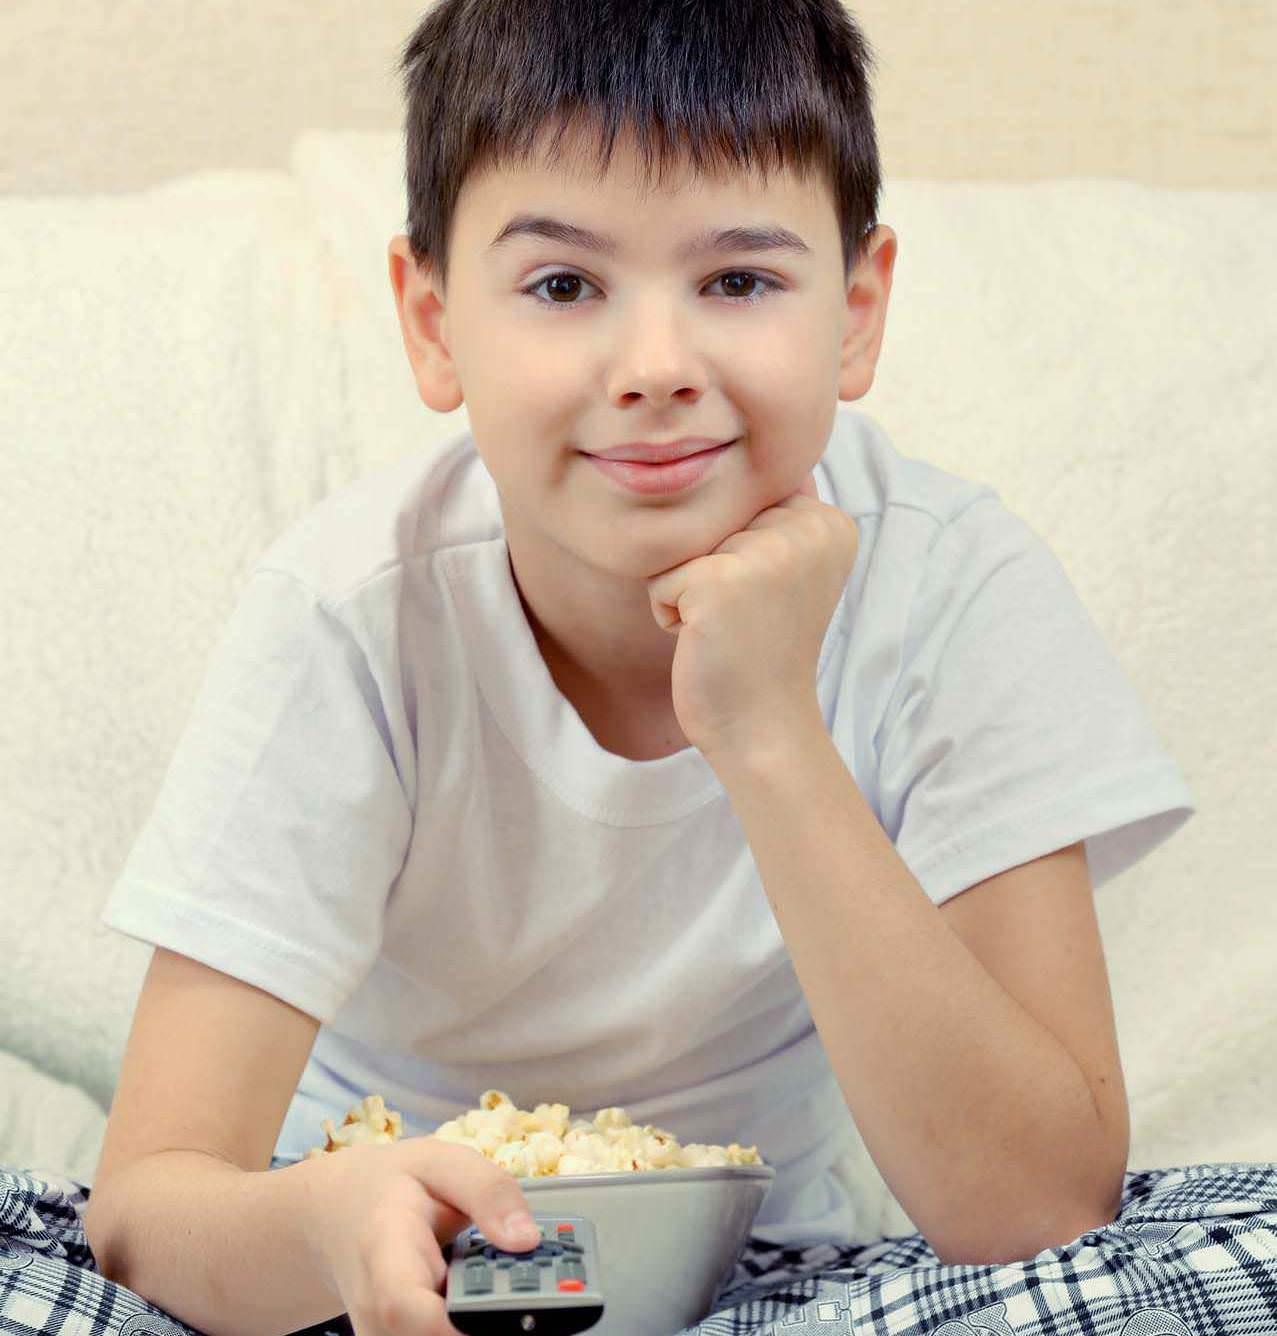 5 Ways To Get Your Kid's Innocent Childhood Back!